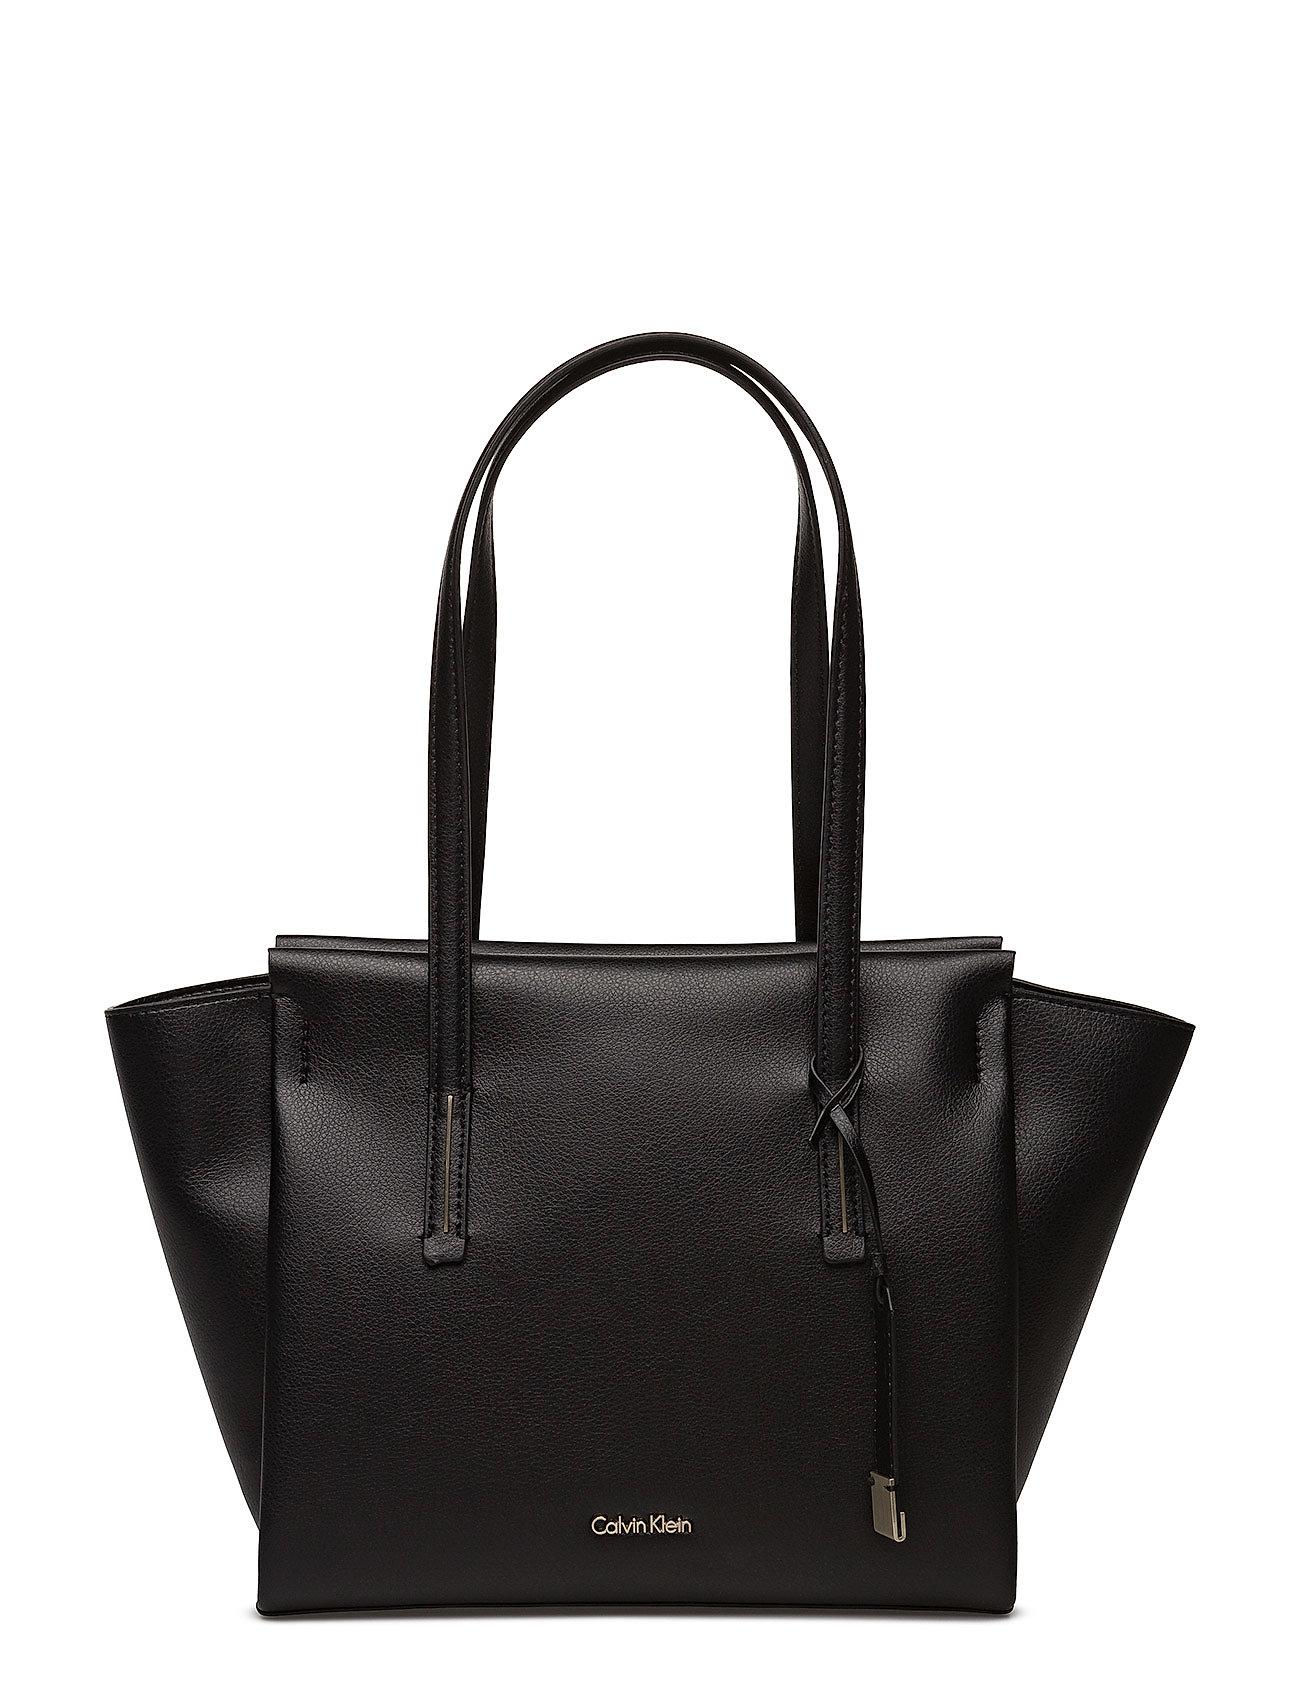 Cadre De Support De Client Calvin Klein « Black k3TSg0w